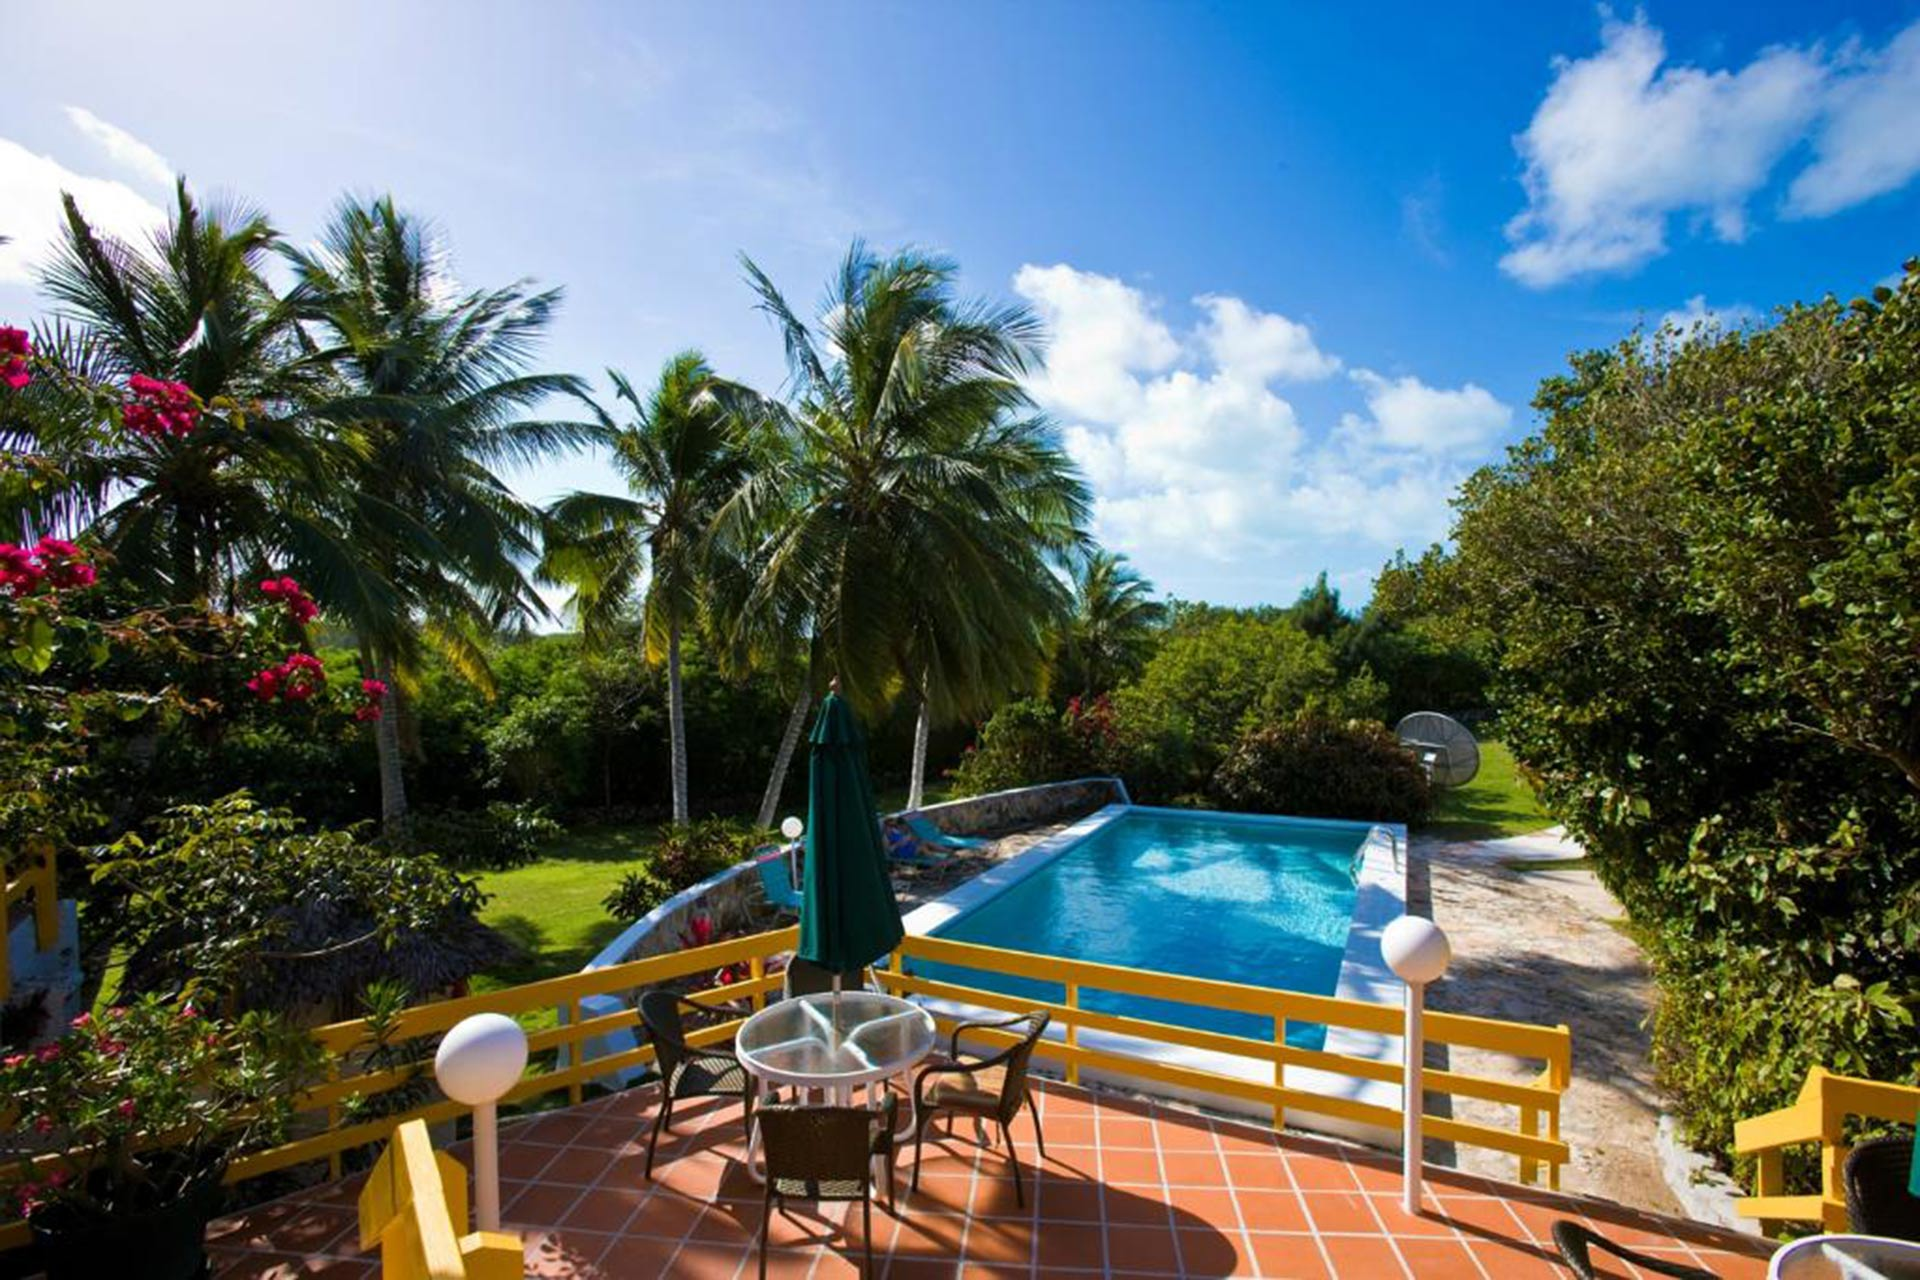 Stella Maris Resort Club in the Bahamas; Photo Courtesy of Stella Maris Resort Club